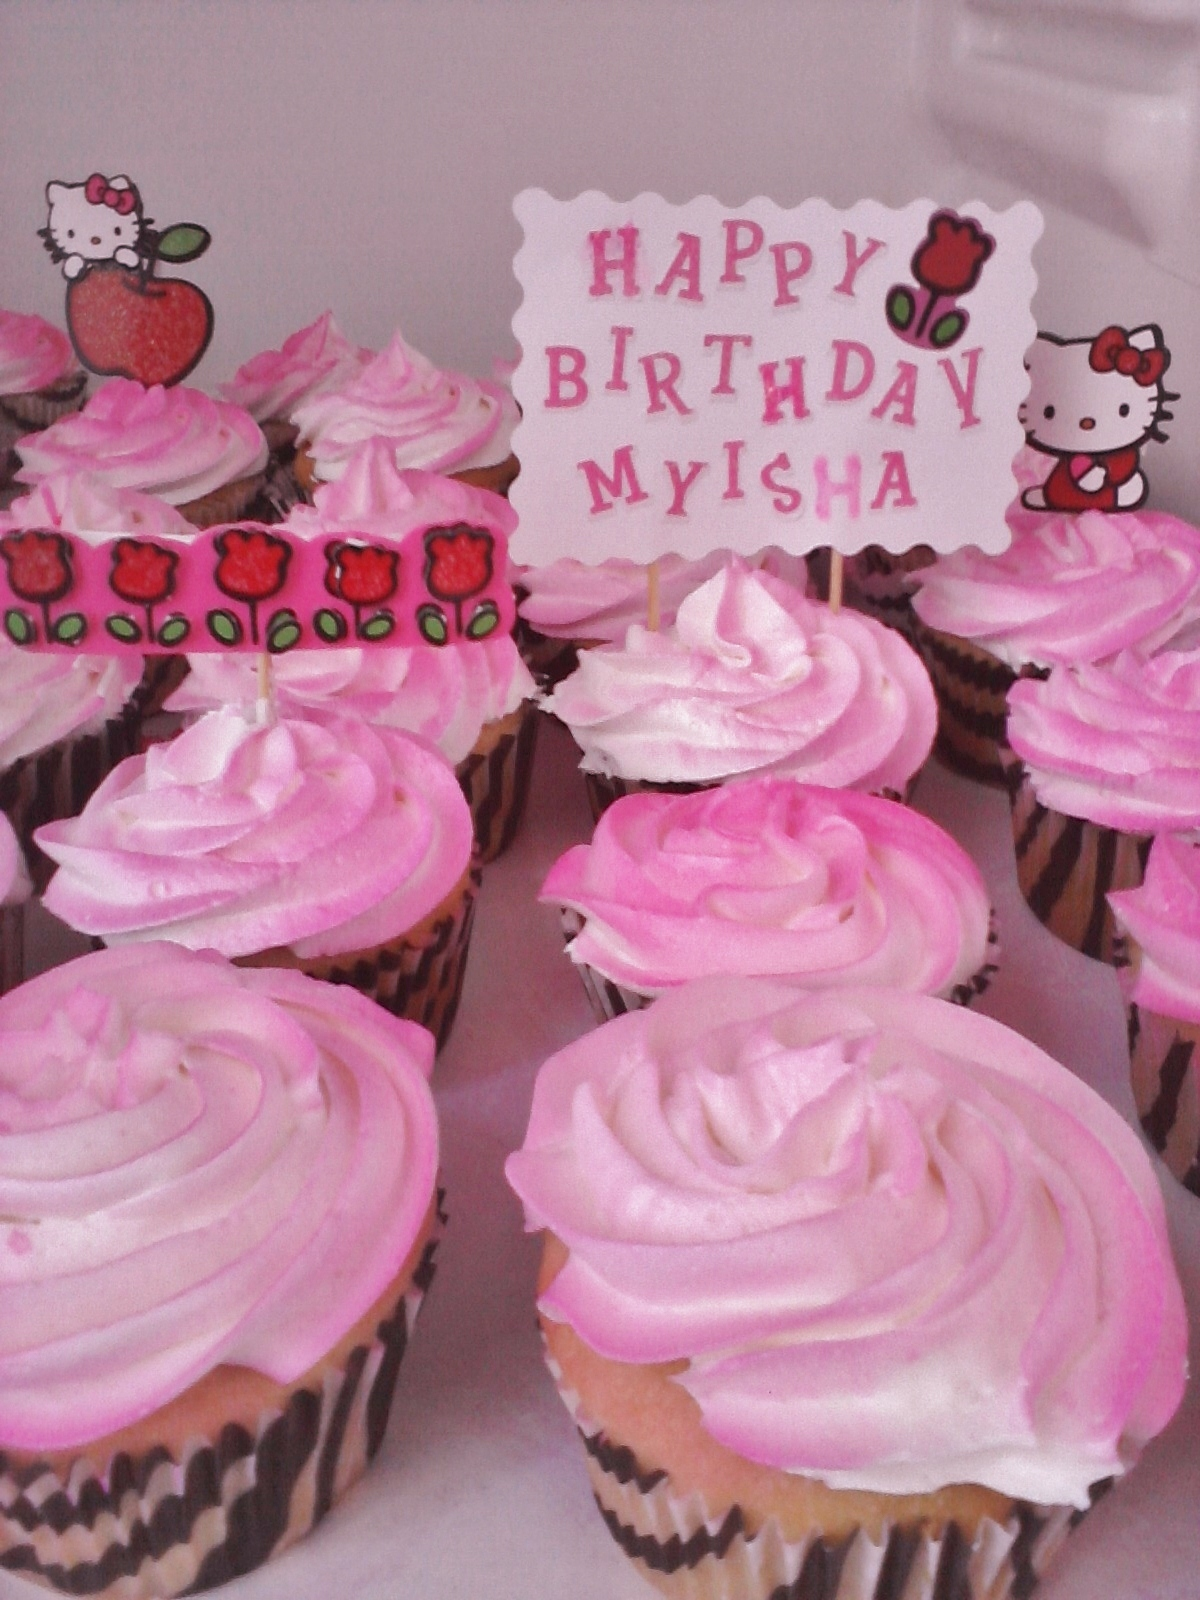 Cake Decorating Classes Near Pomona Ca : Big Bettie cakes: Hello Kitty Cupcakes